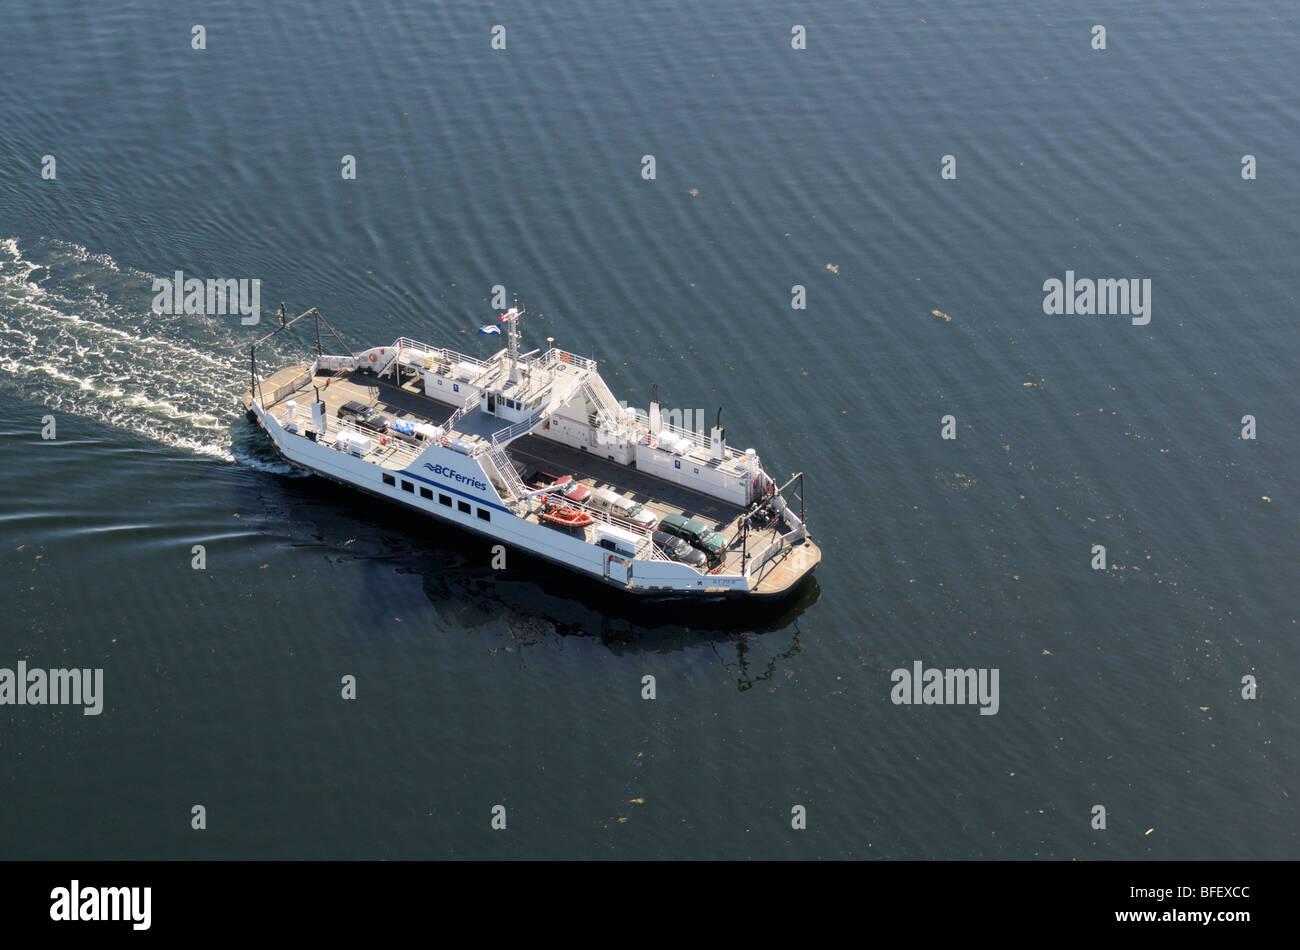 Aerial photograph of BC Ferry Kuper, Chemainus, Vancouver Island, British Columbia, Canada. Stock Photo